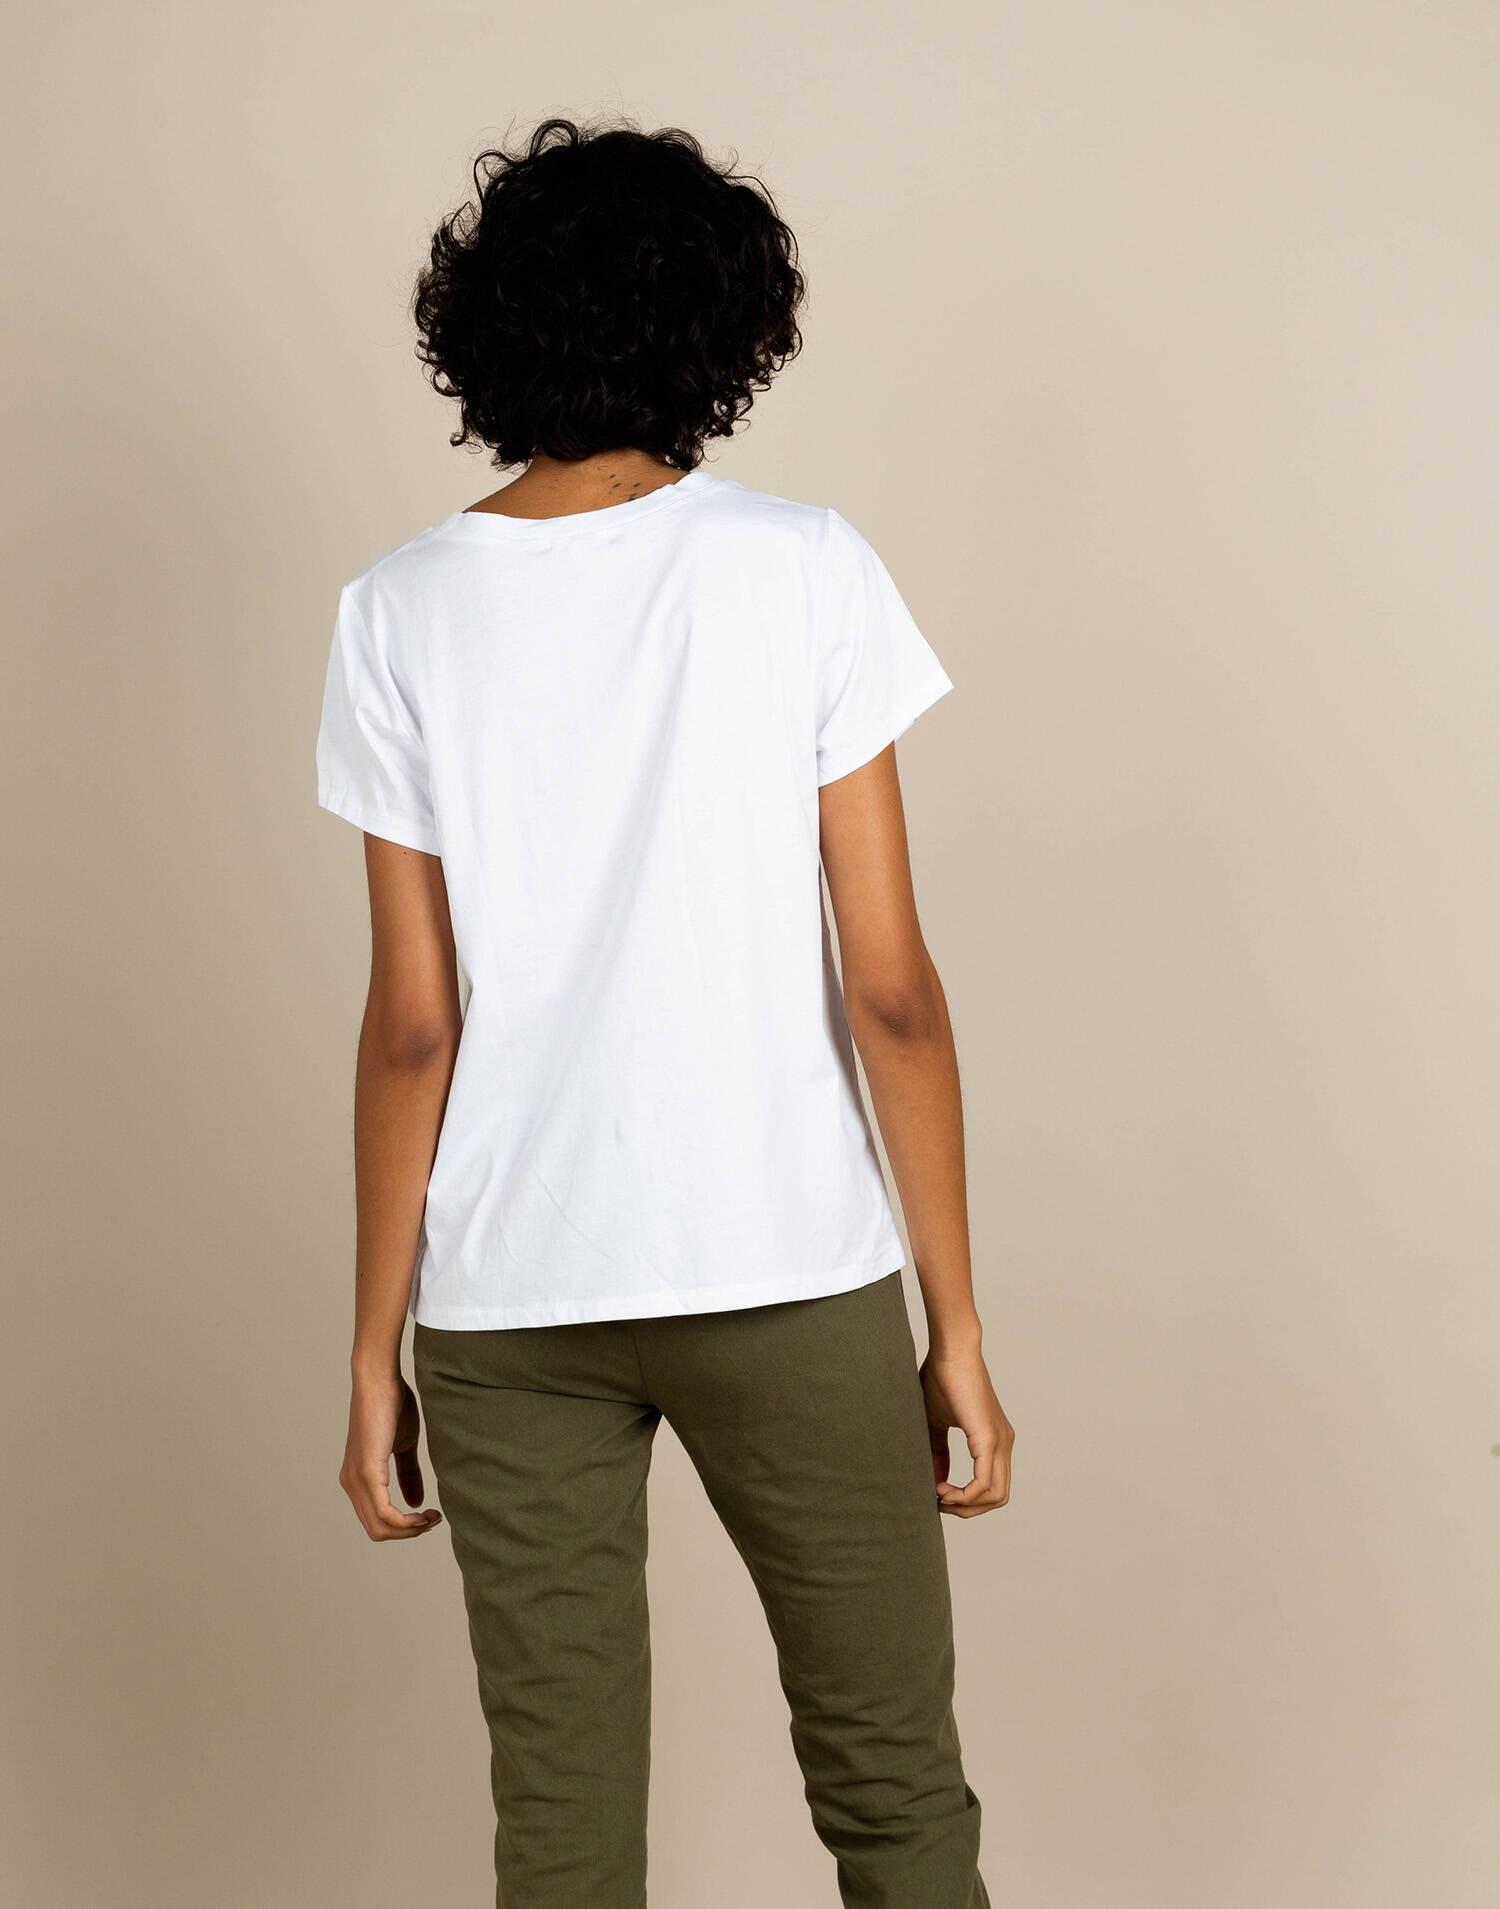 Camiseta mexico lindo